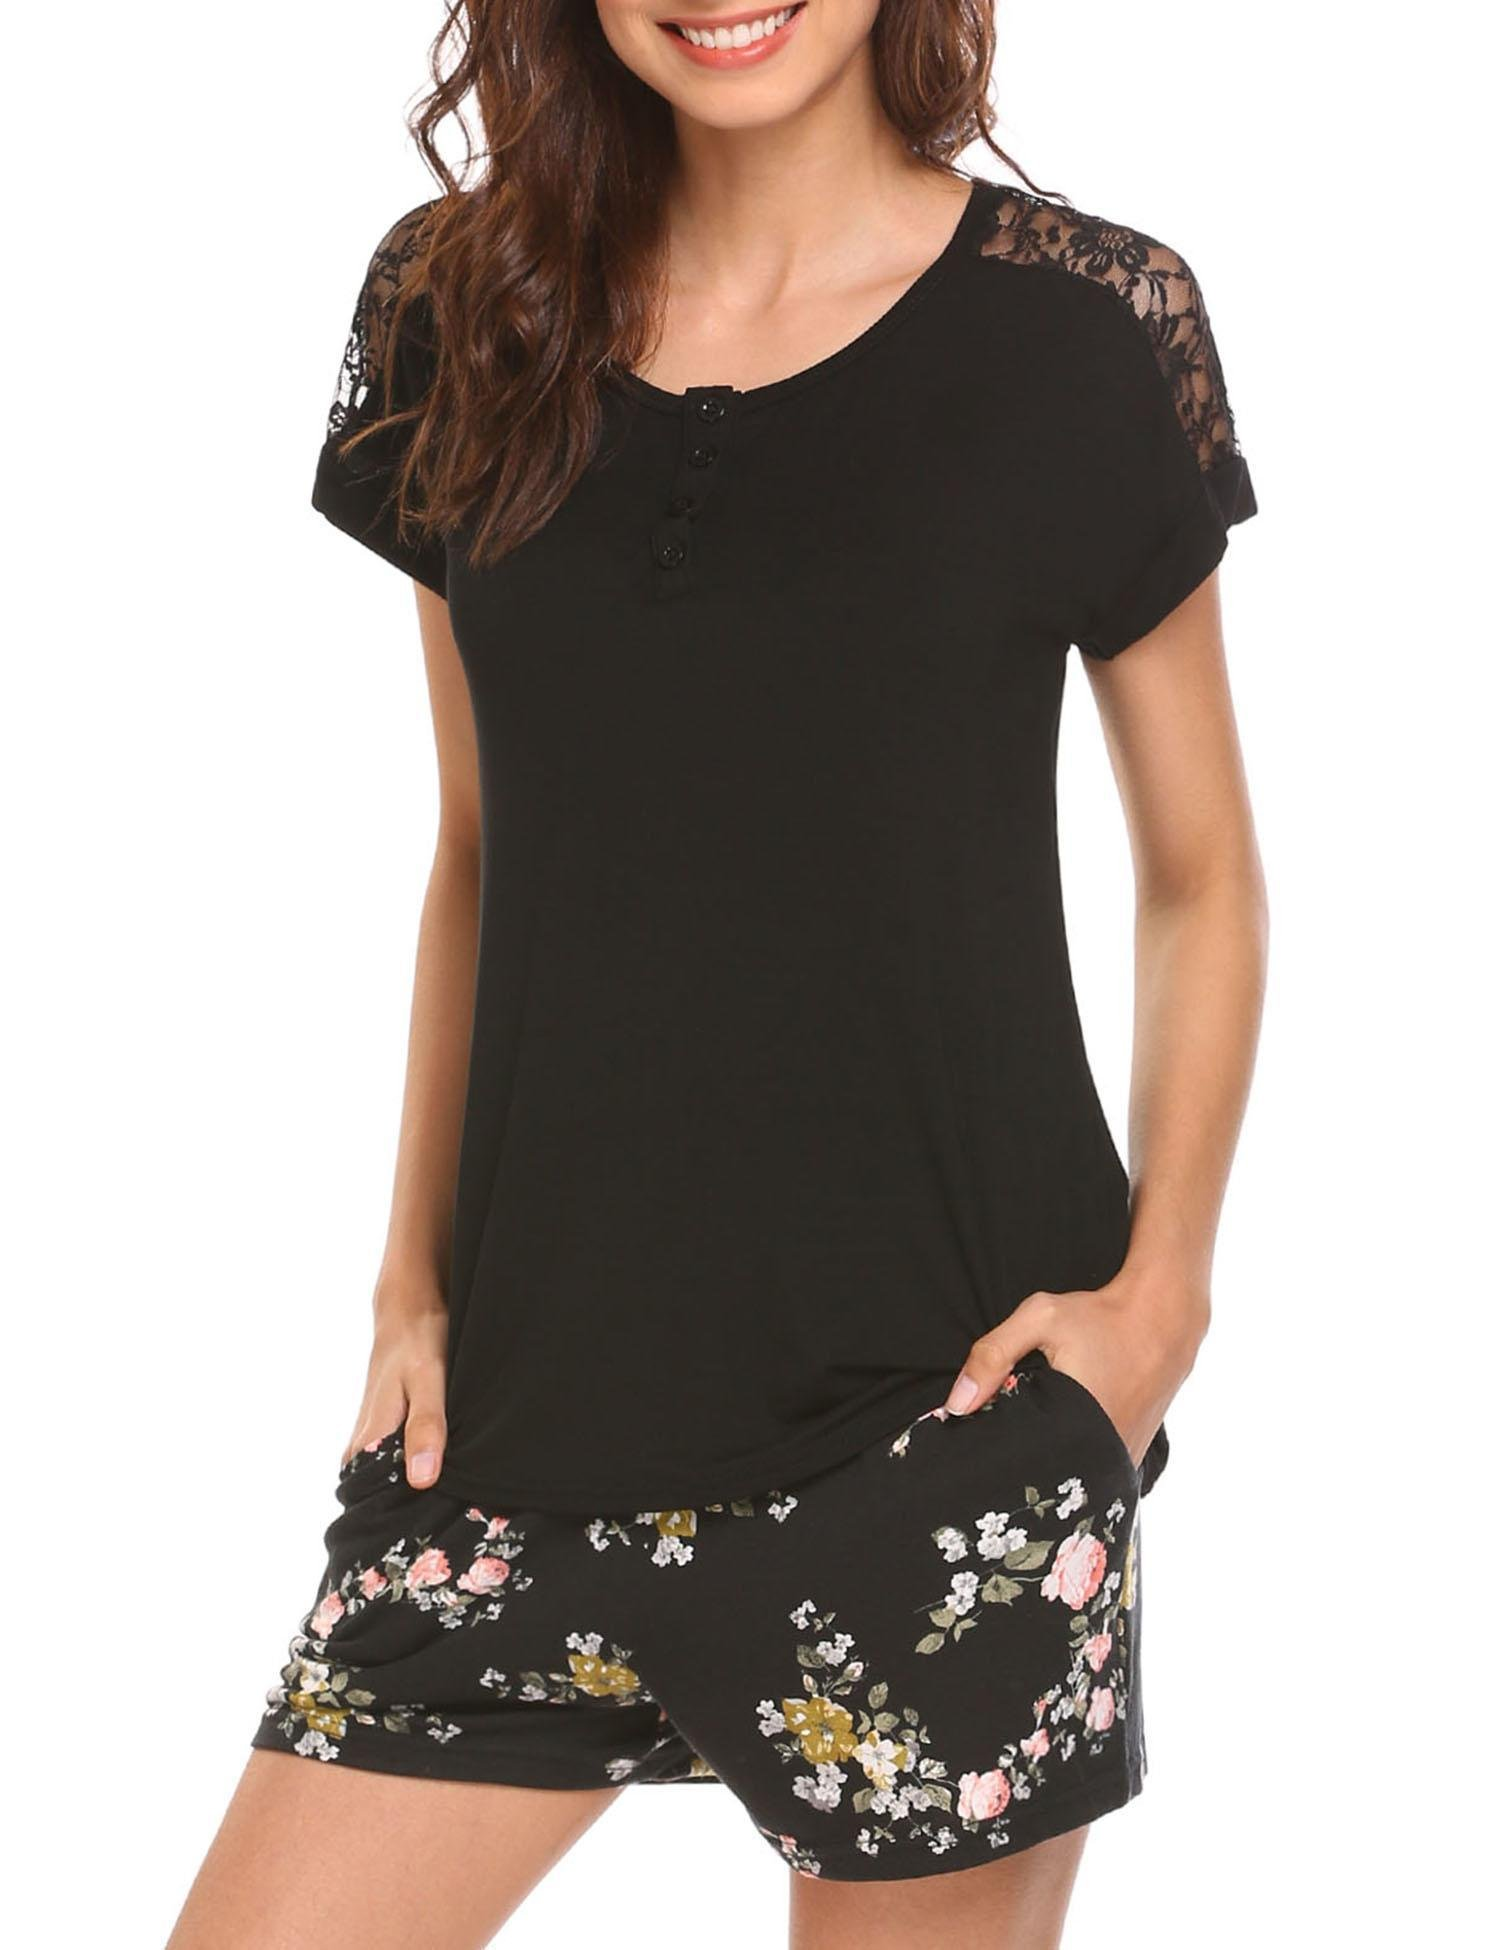 MAXMODA Women's Pajama Set Floral Short Sleeve Sleepwear Pjs Sets Ladies 2-Piece Nightwear